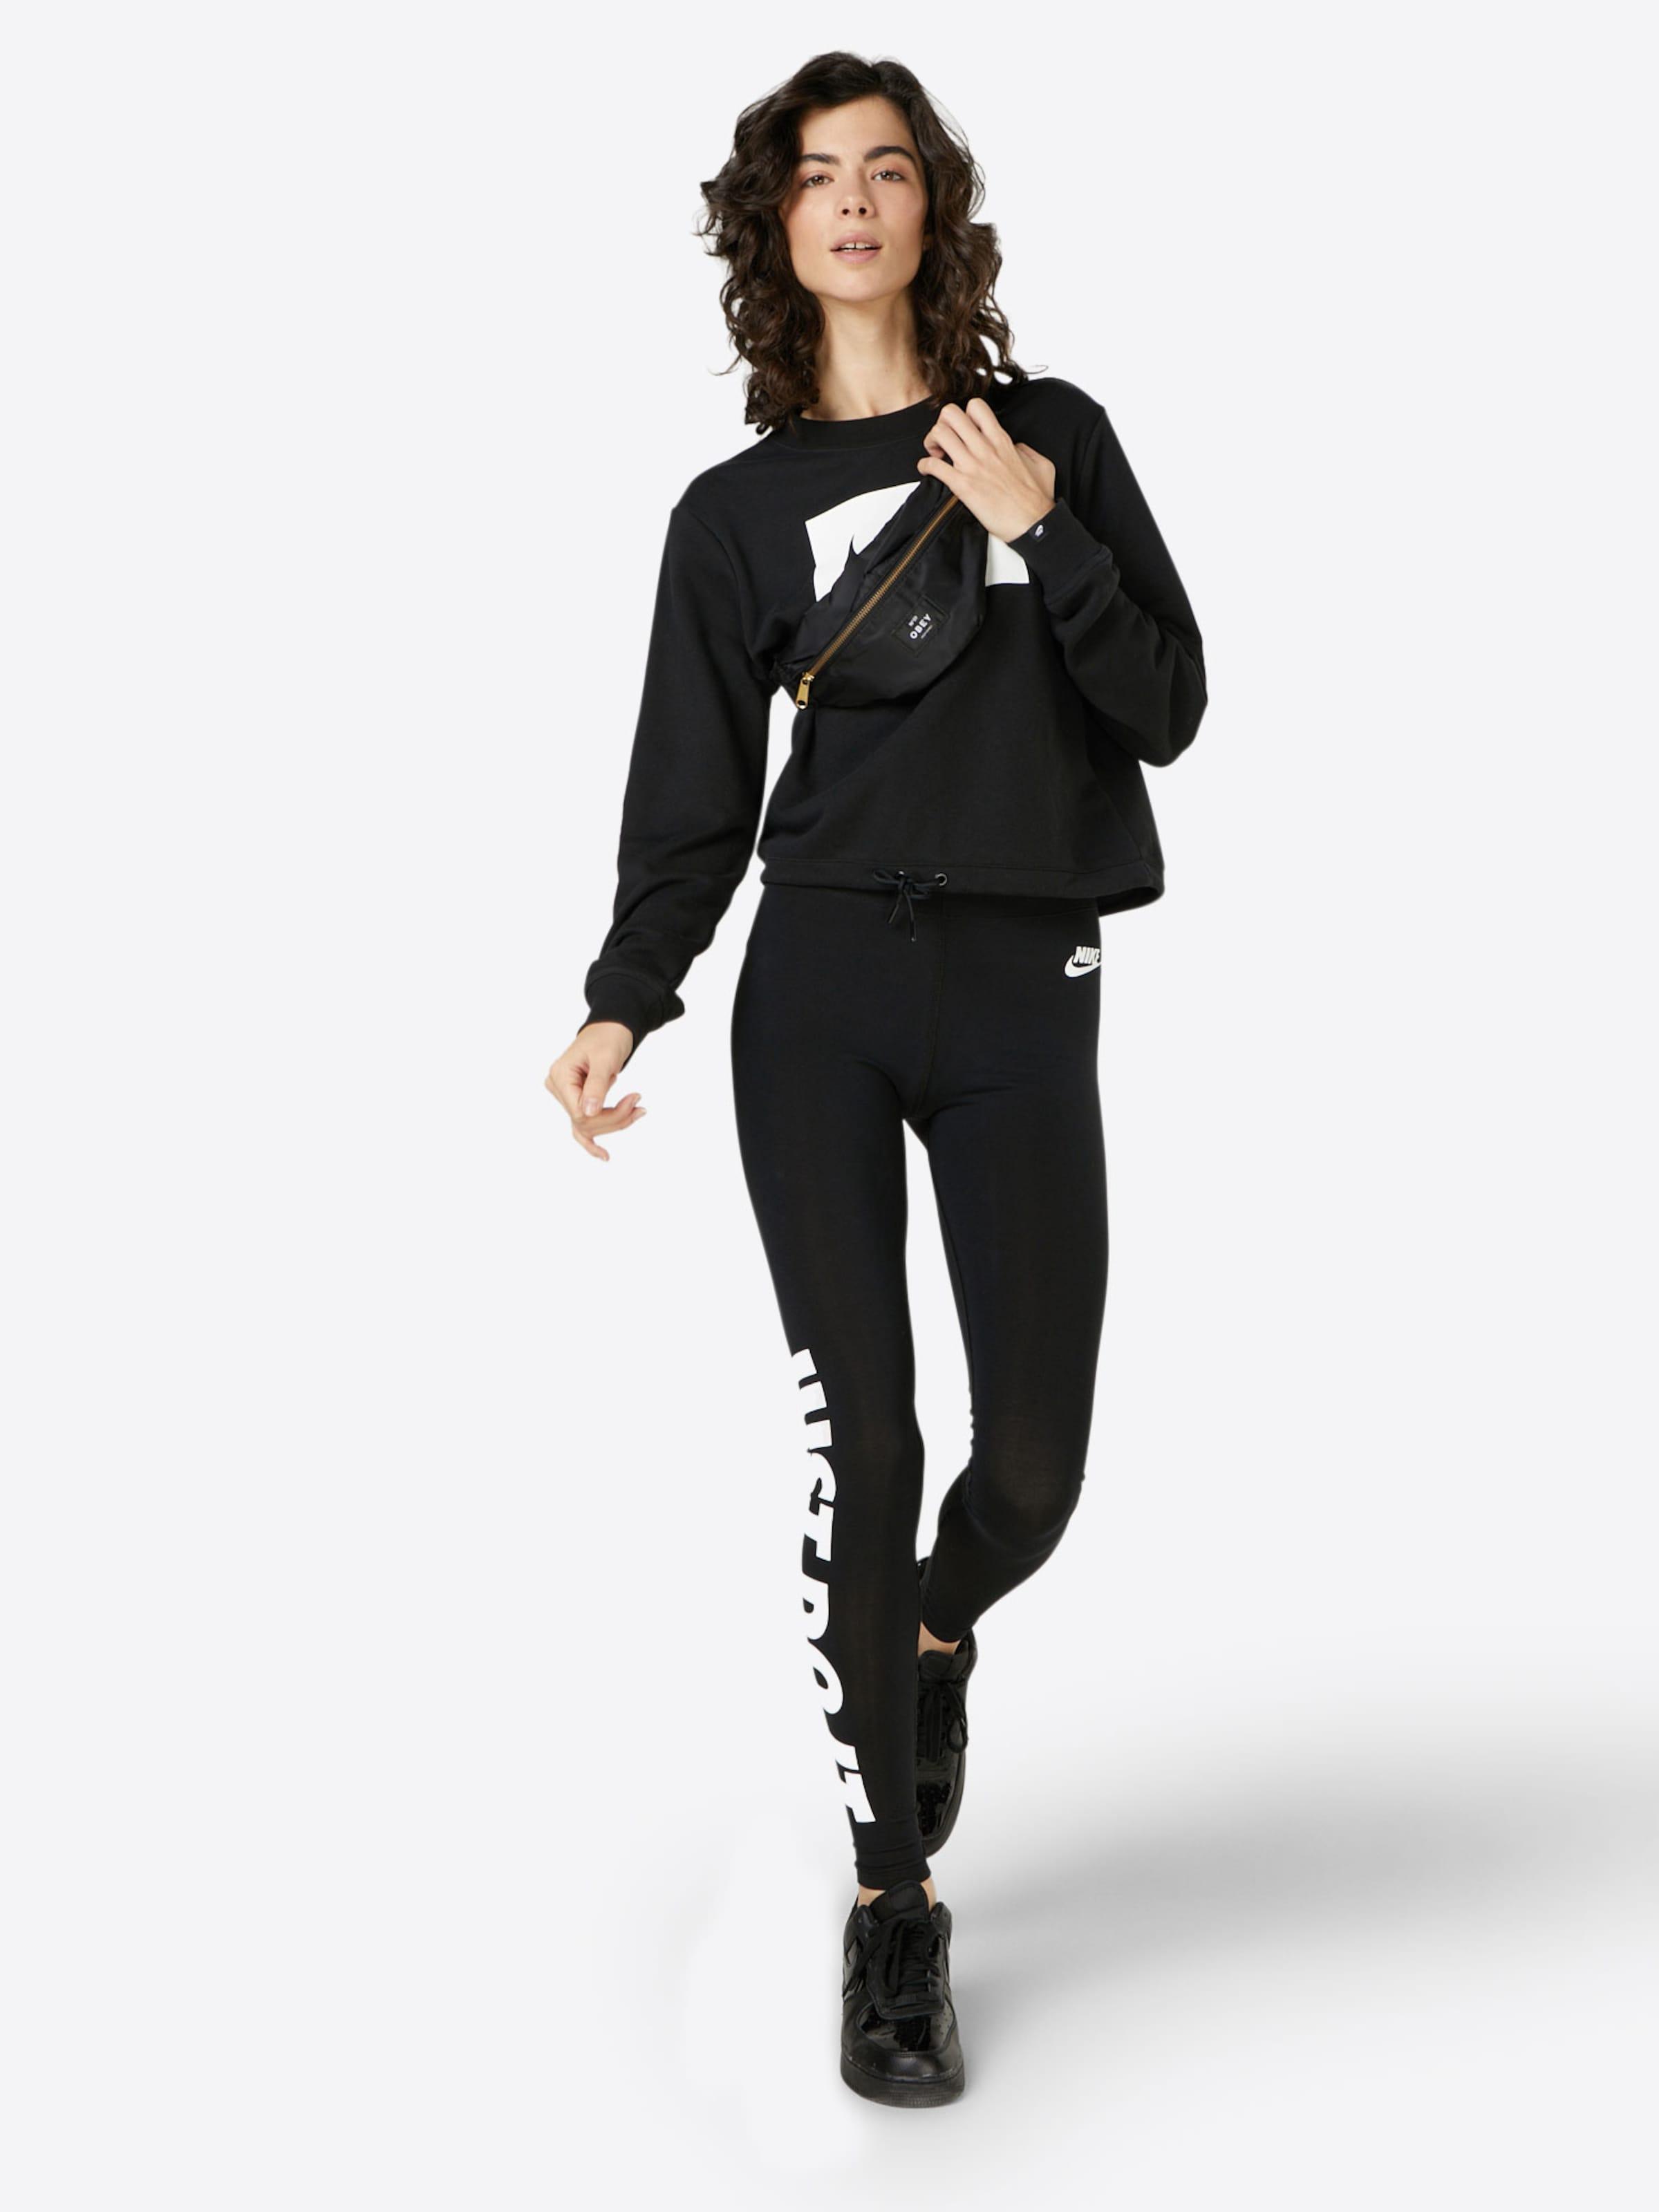 Nike Sportswear Leggings Vermarktbare Günstig Online KiM0wRqWO2